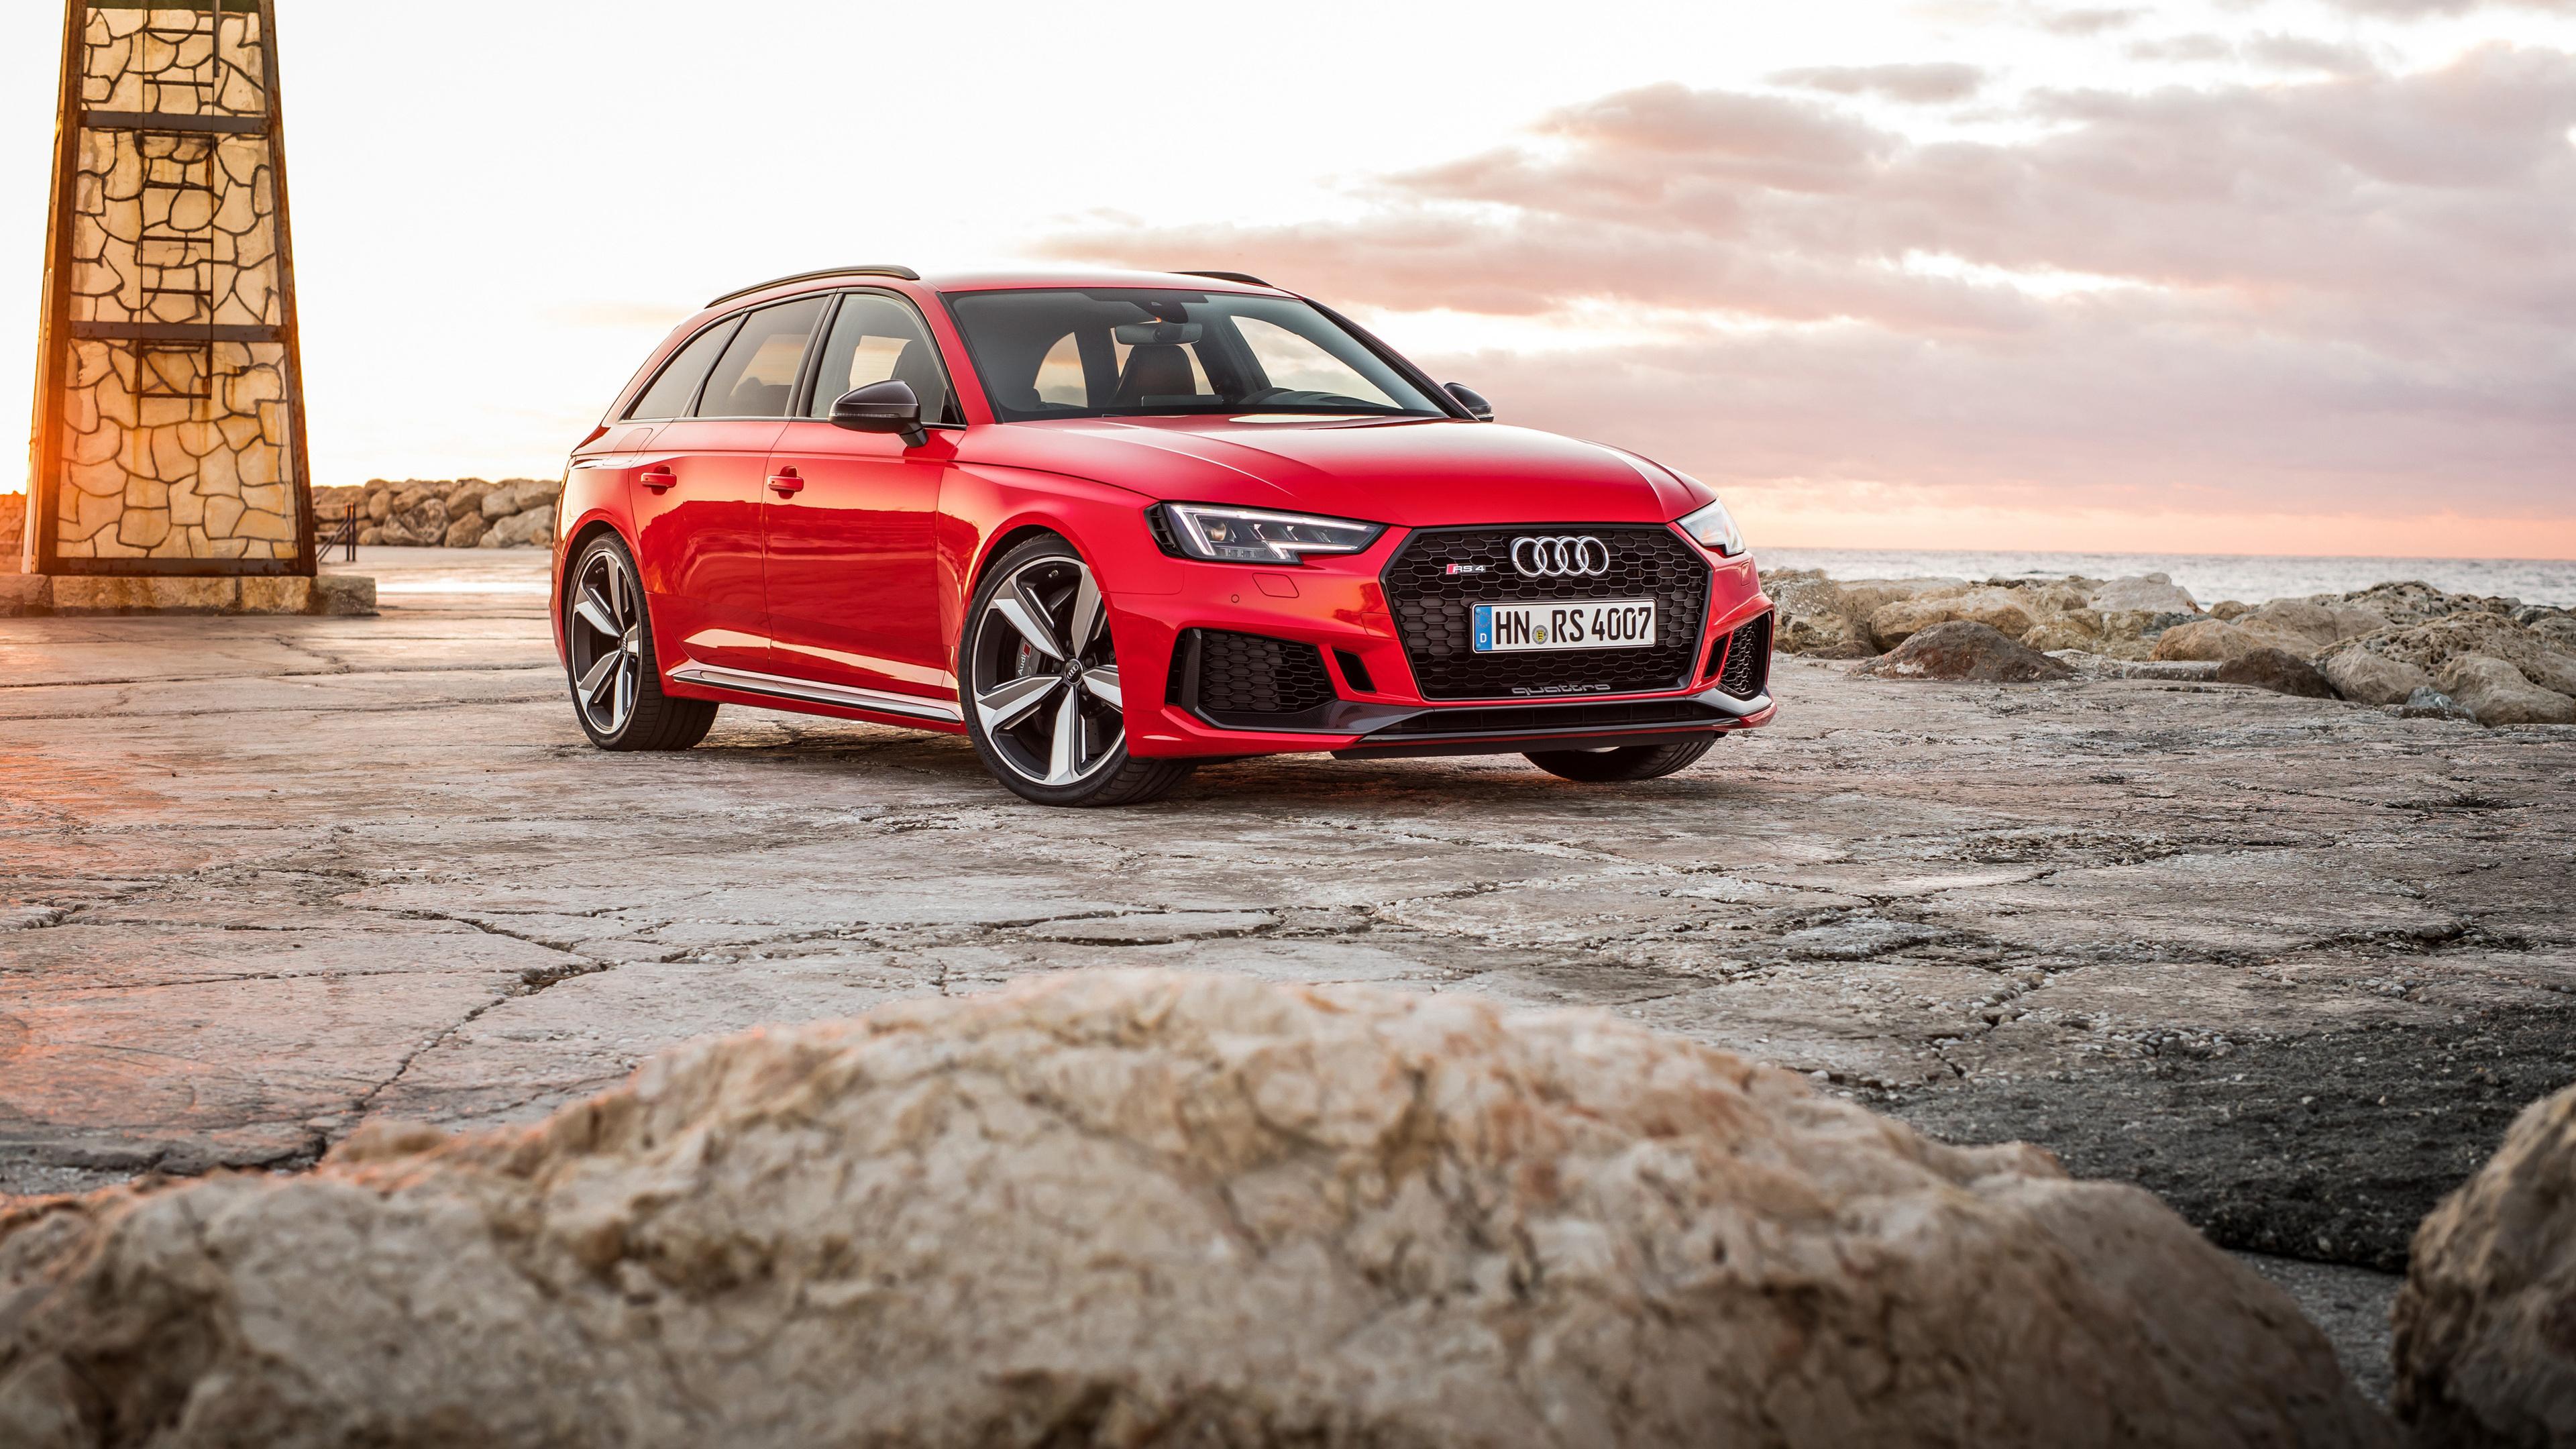 audi rs 4 avant 2017 1539108564 - Audi RS 4 Avant 2017 - hd-wallpapers, cars wallpapers, audi wallpapers, audi rs 4 avant wallpapers, 4k-wallpapers, 2017 cars wallpapers